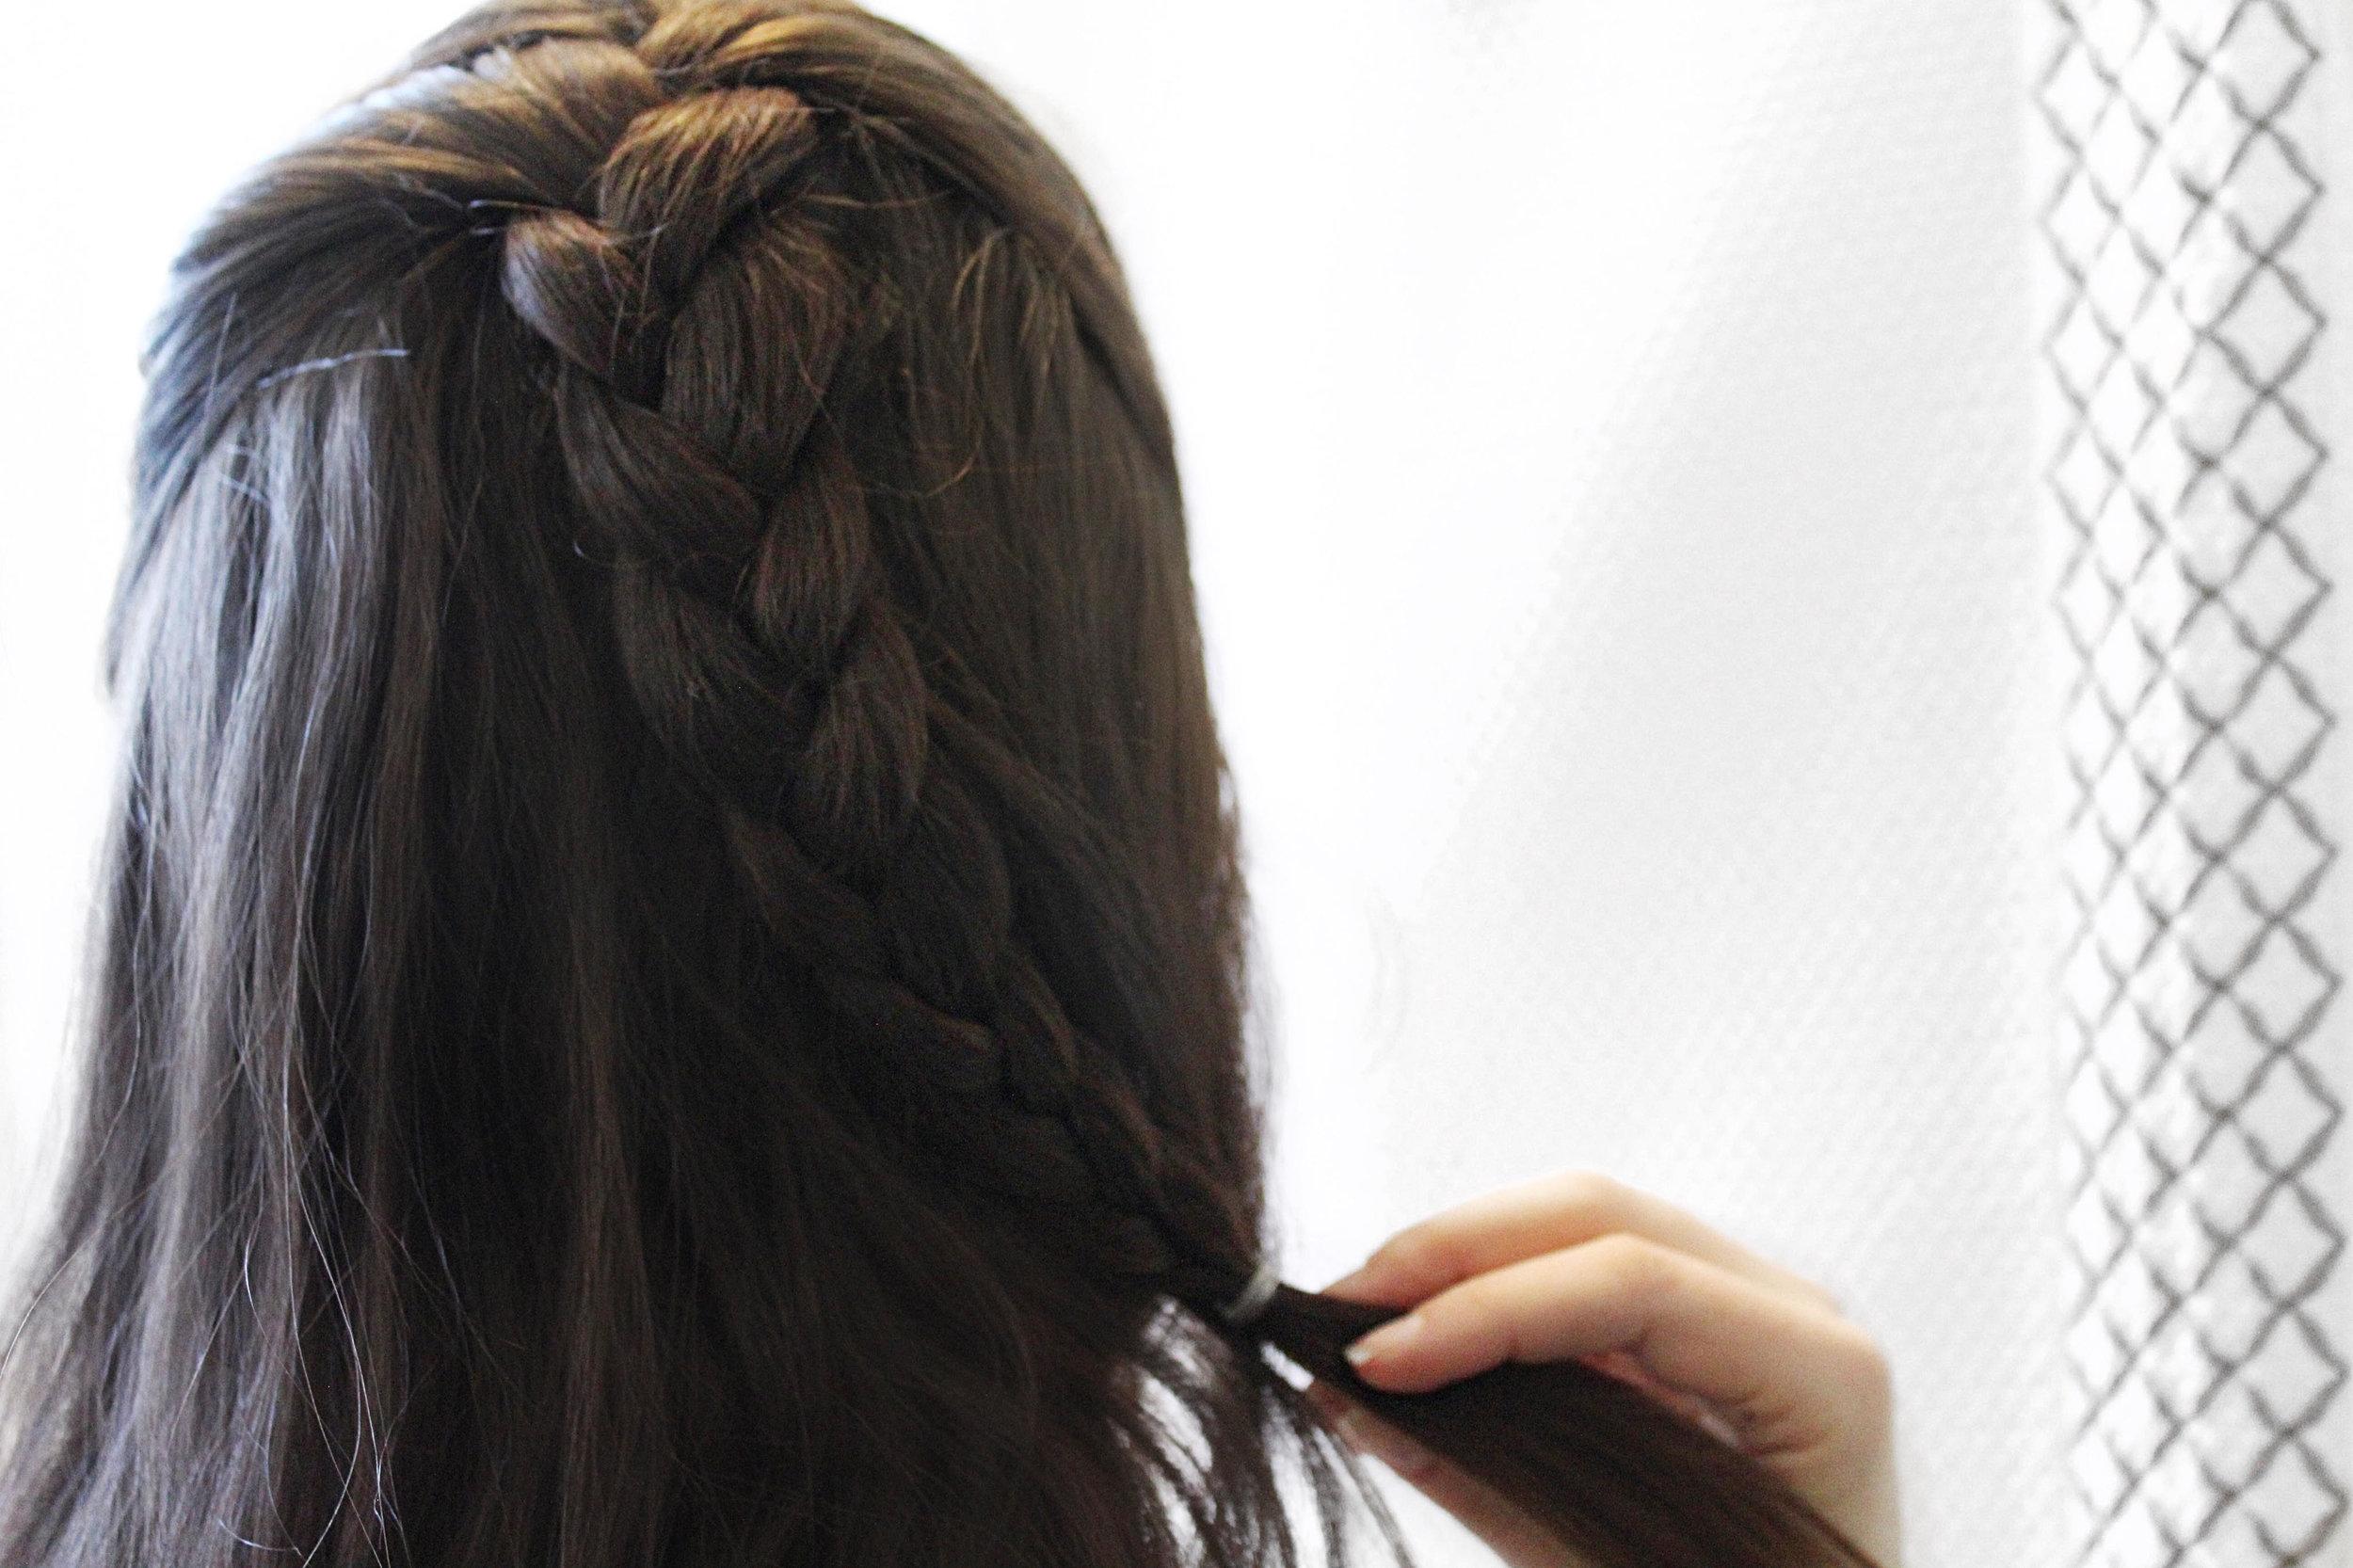 braided-bun-hair-do.jpg